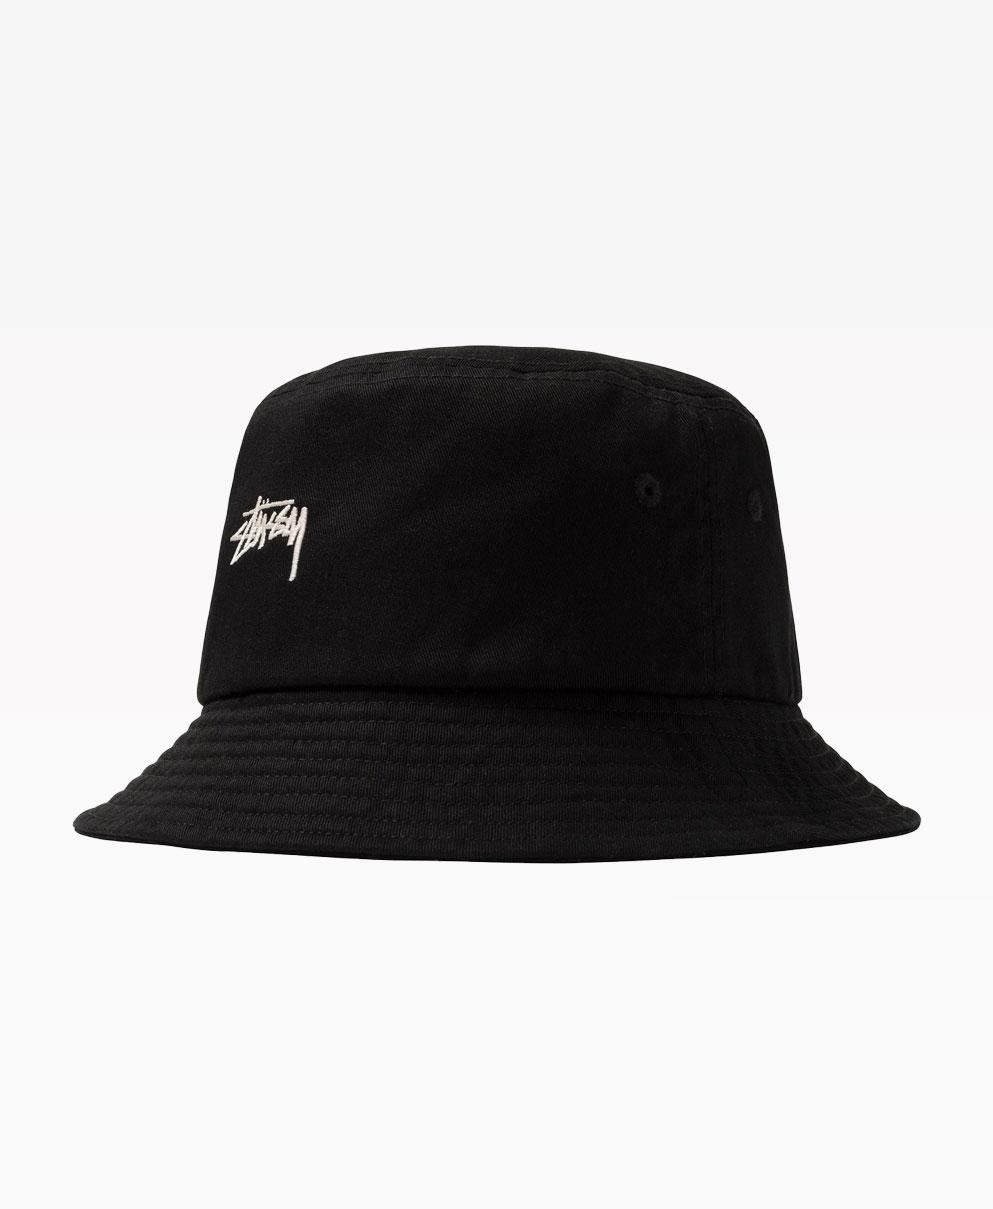 Stussy Stock Bucket Hat Black Front